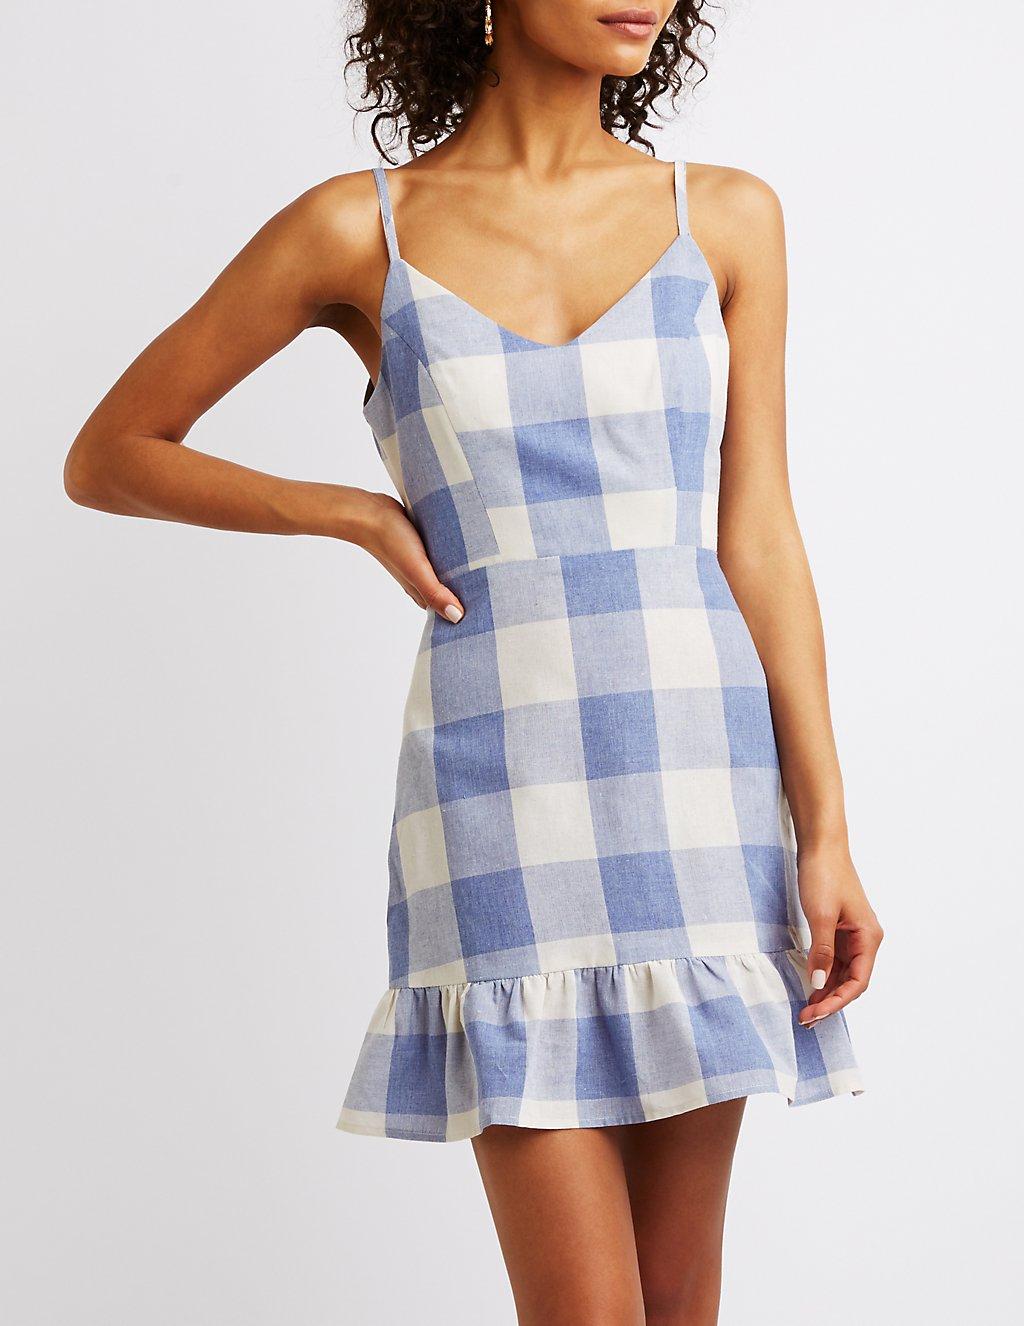 Charlotte Russe Gingham Print Ruffle-Trim Dress